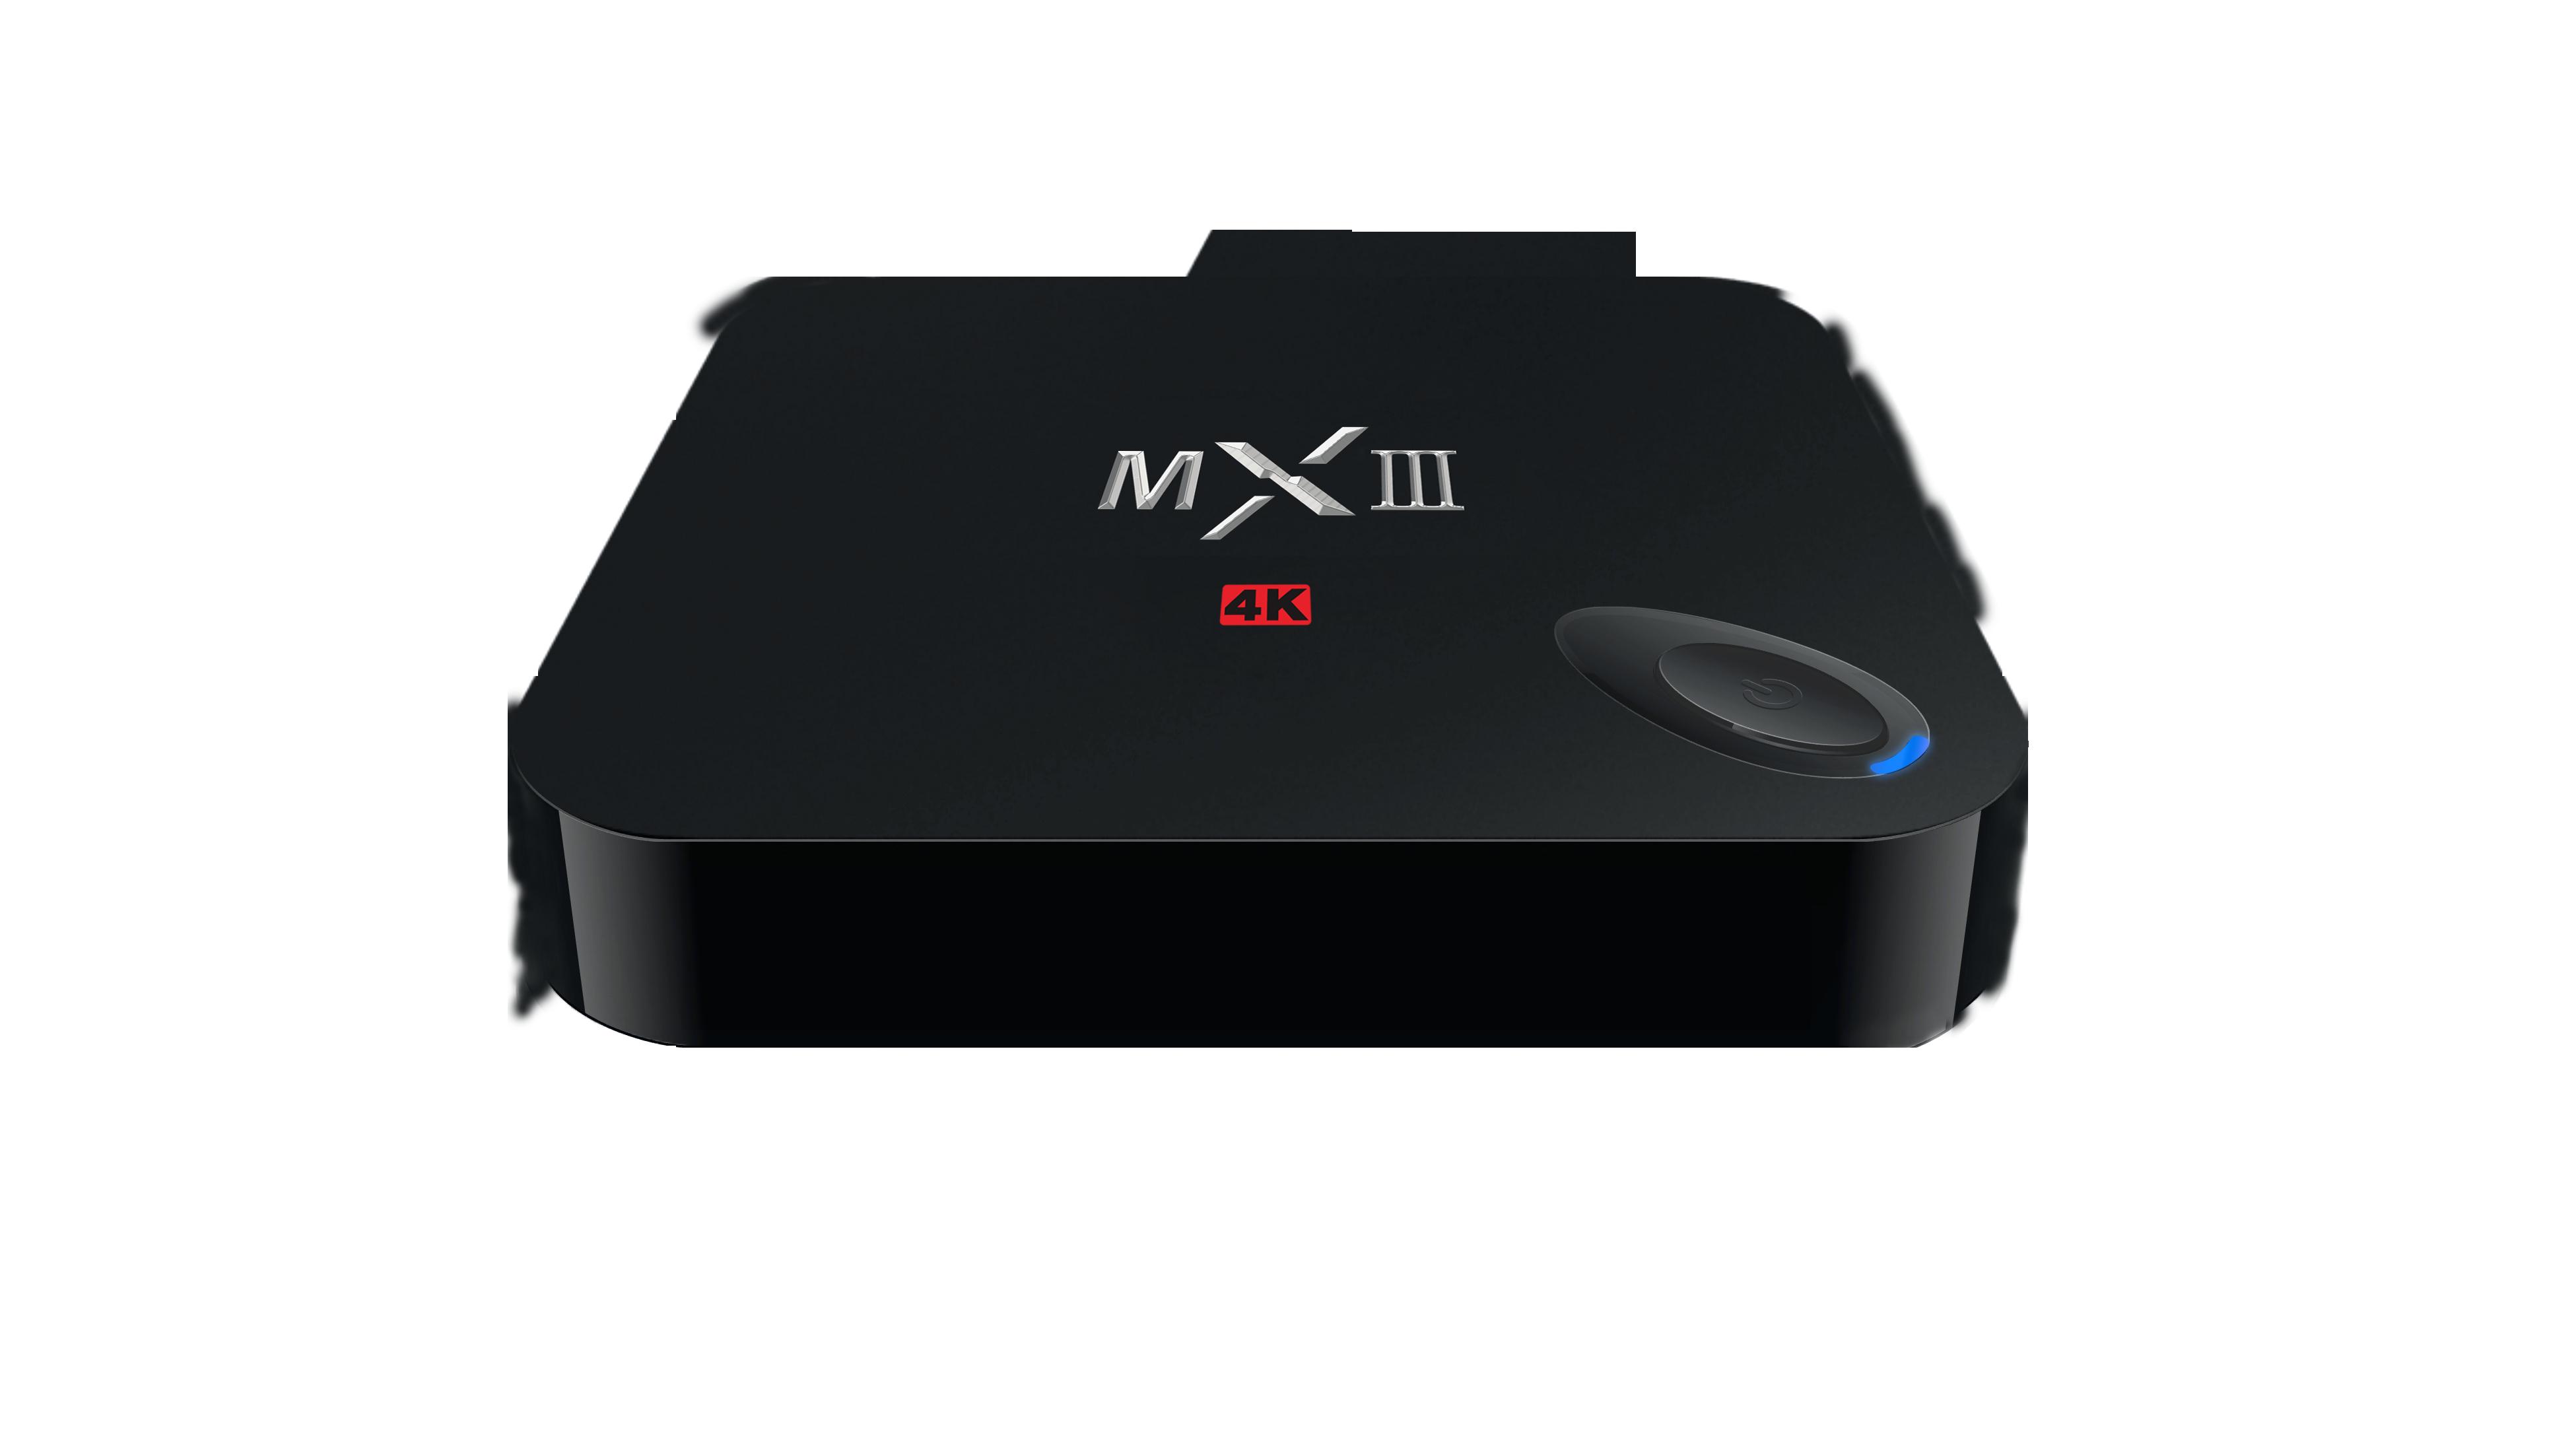 MXIII MX3 ANDROID TV BOX AMLOGIC KODI XBMC